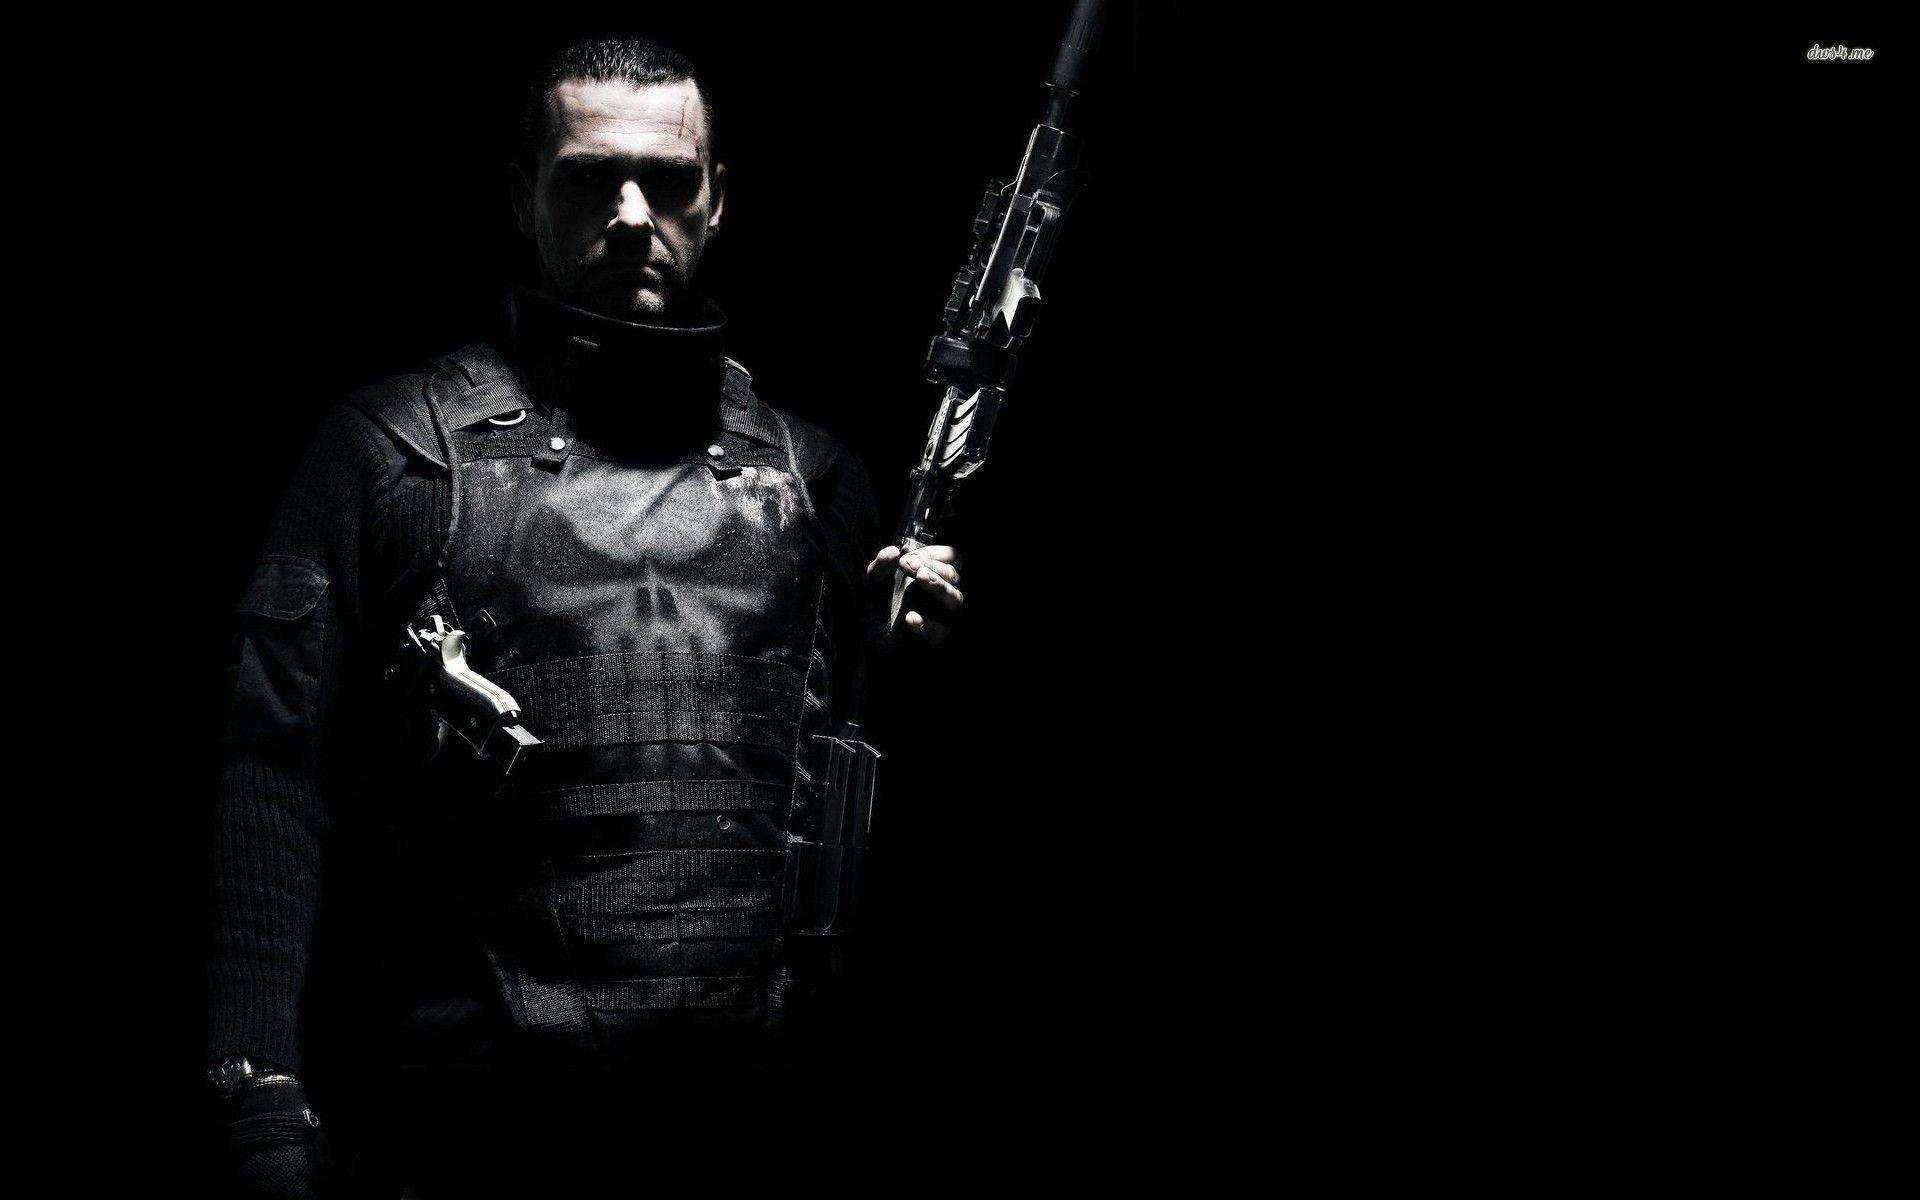 Handsome Prabhas In Black Shirt And Goggle Hd Wallpaper: Punisher Wallpaper Skull ·①